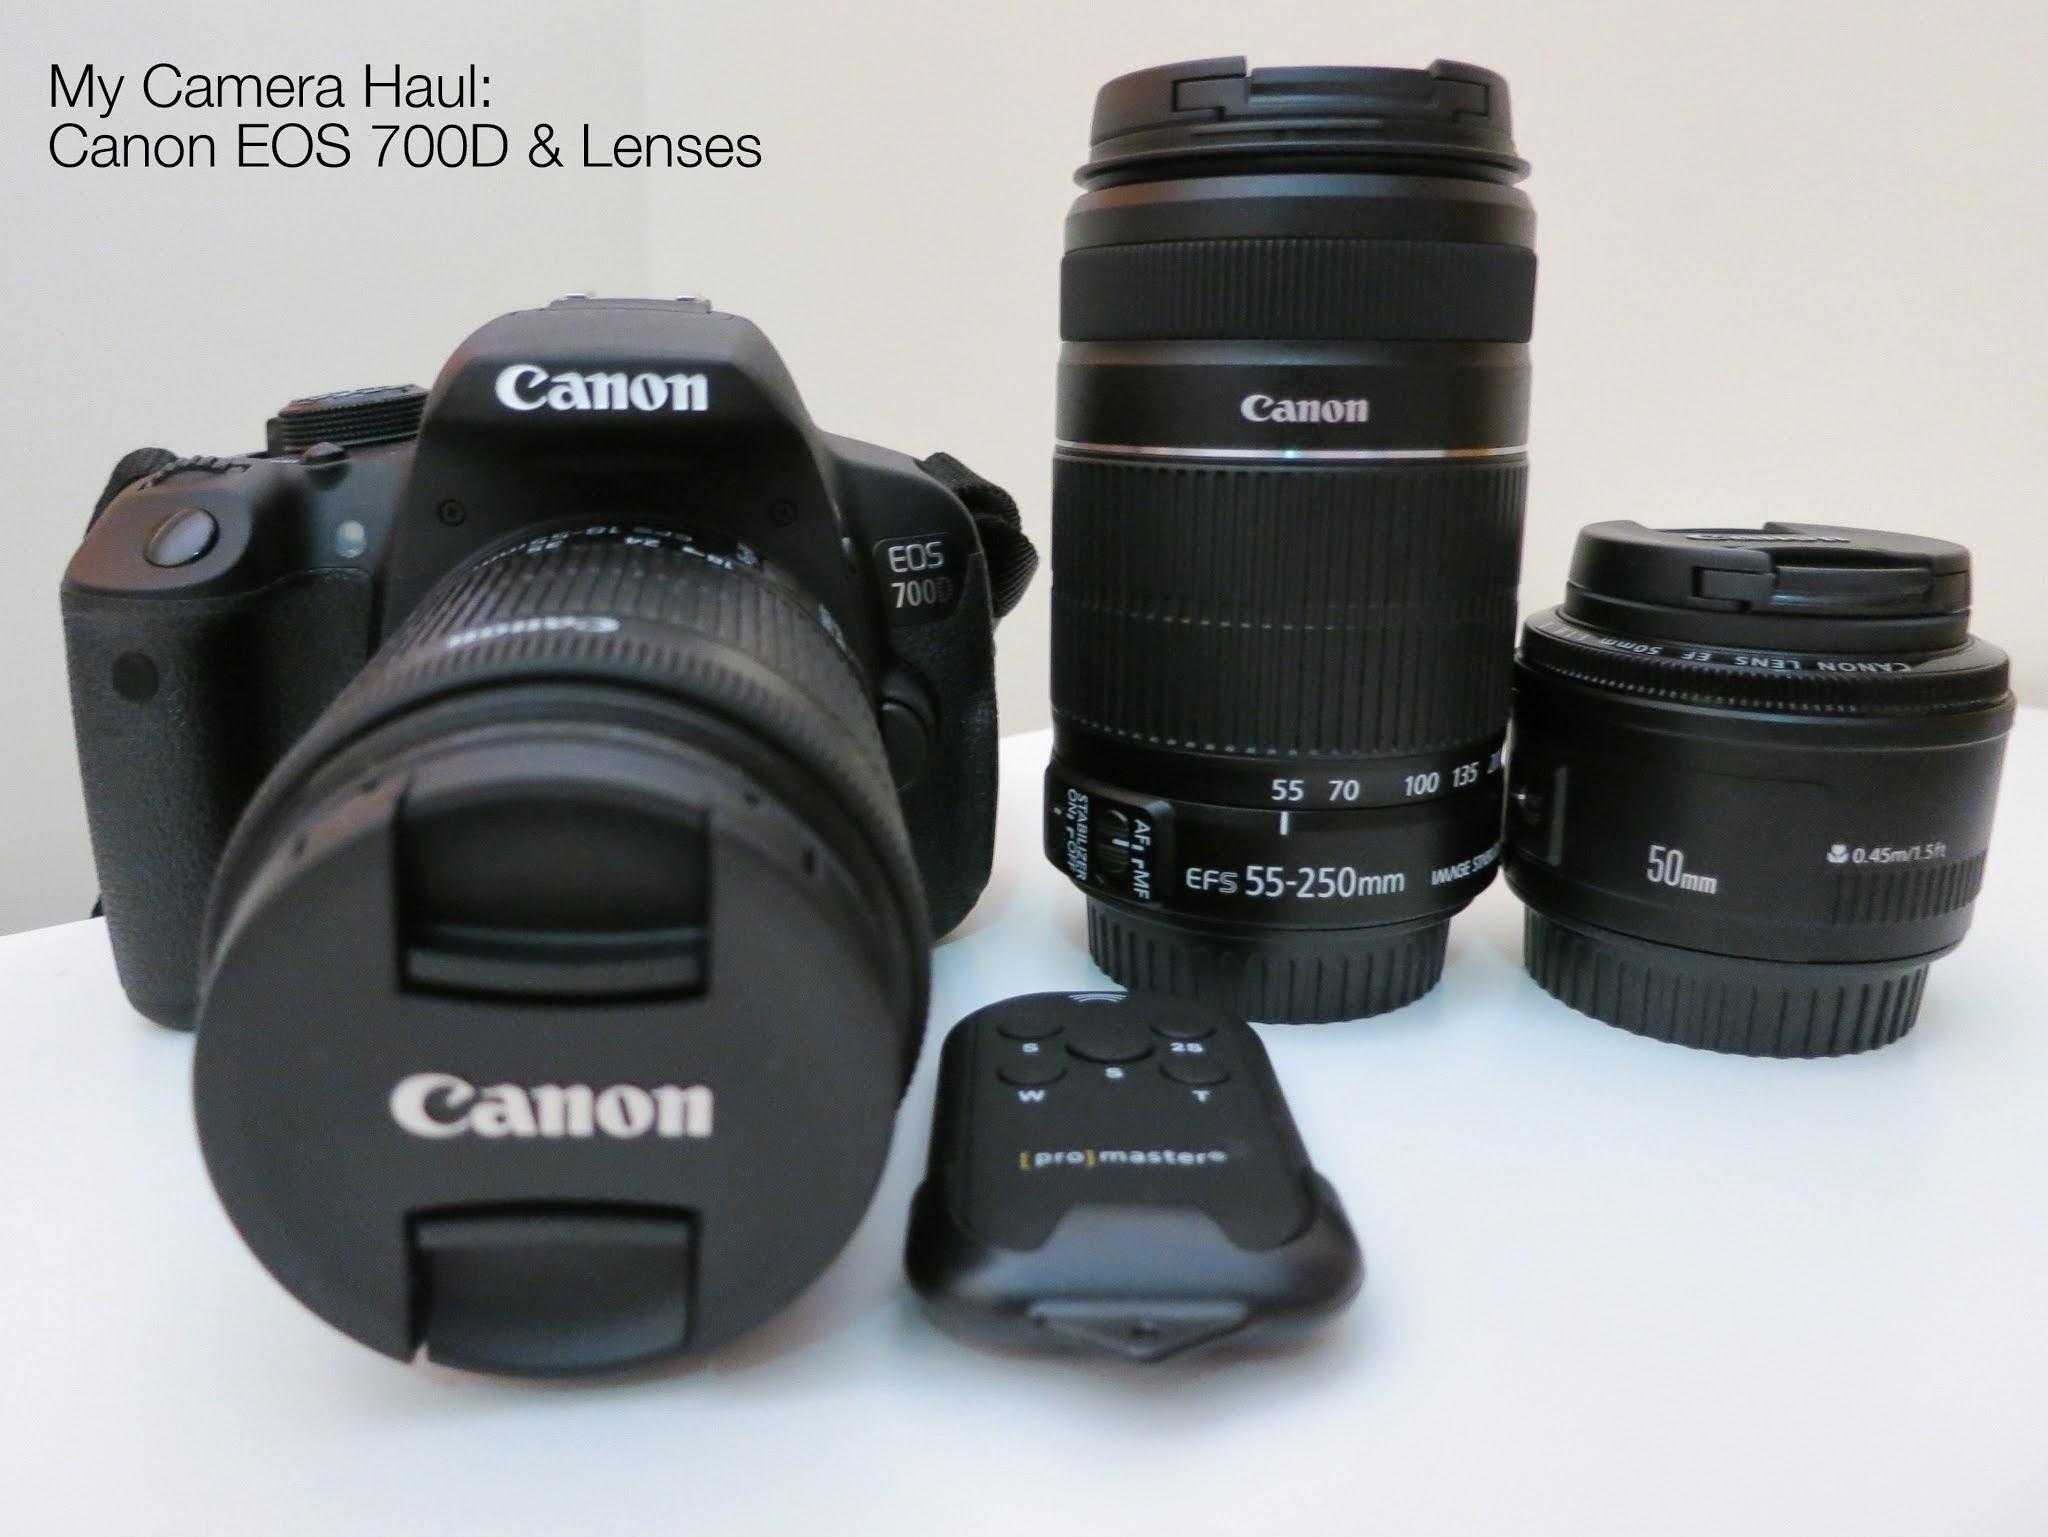 DSLR camera haul, canon eos 700d, canon rebel t5i, lenses, blogger photography haul, blogger camera haul